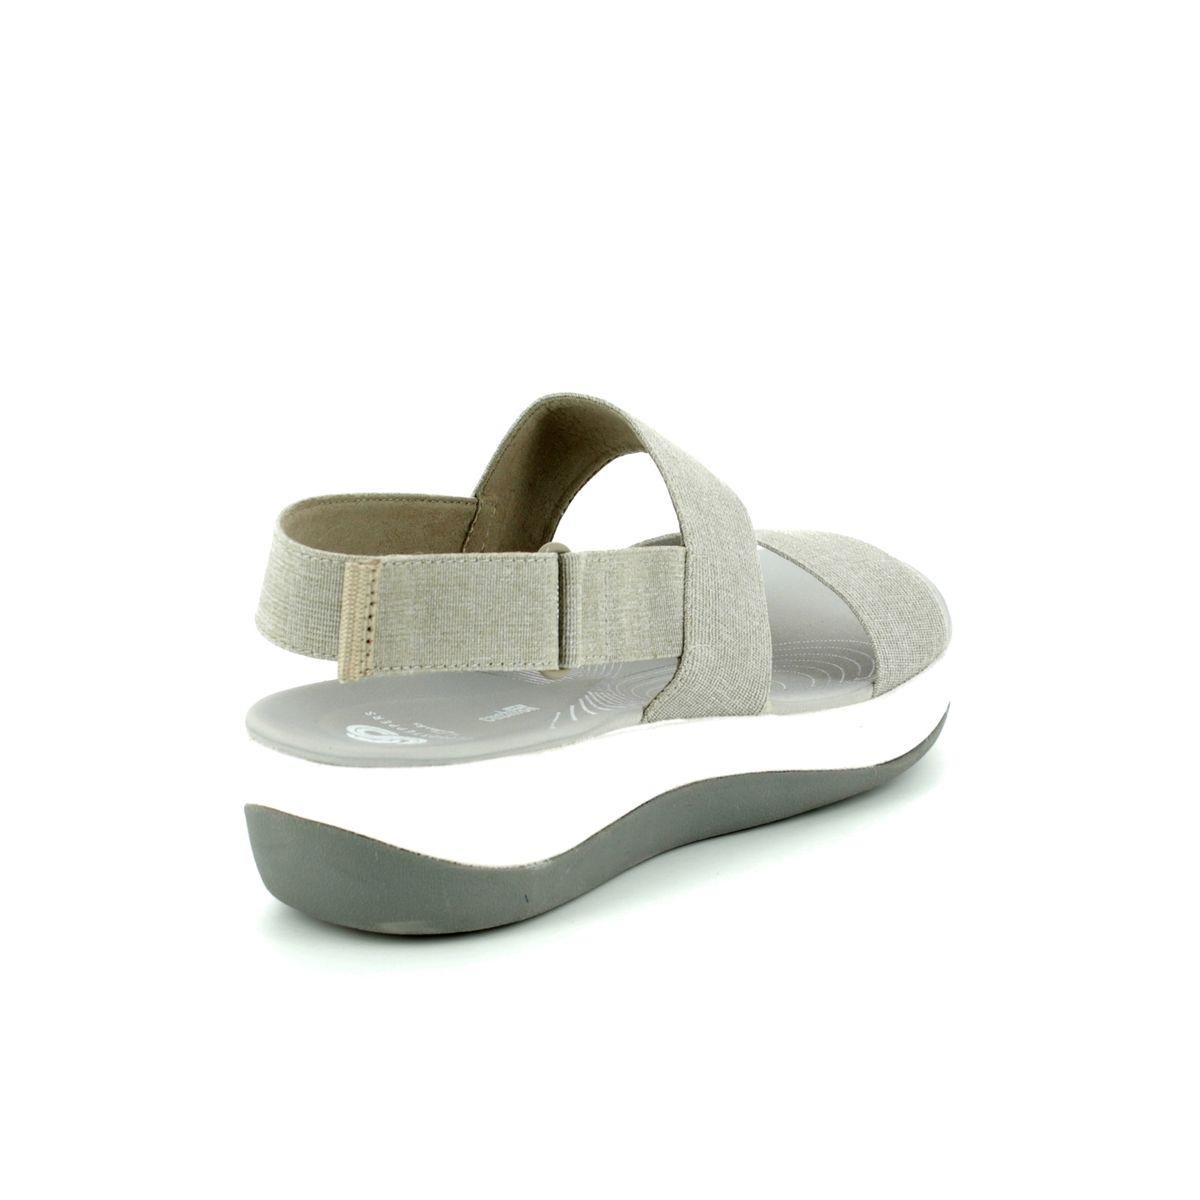 arla jacory clarks sandals